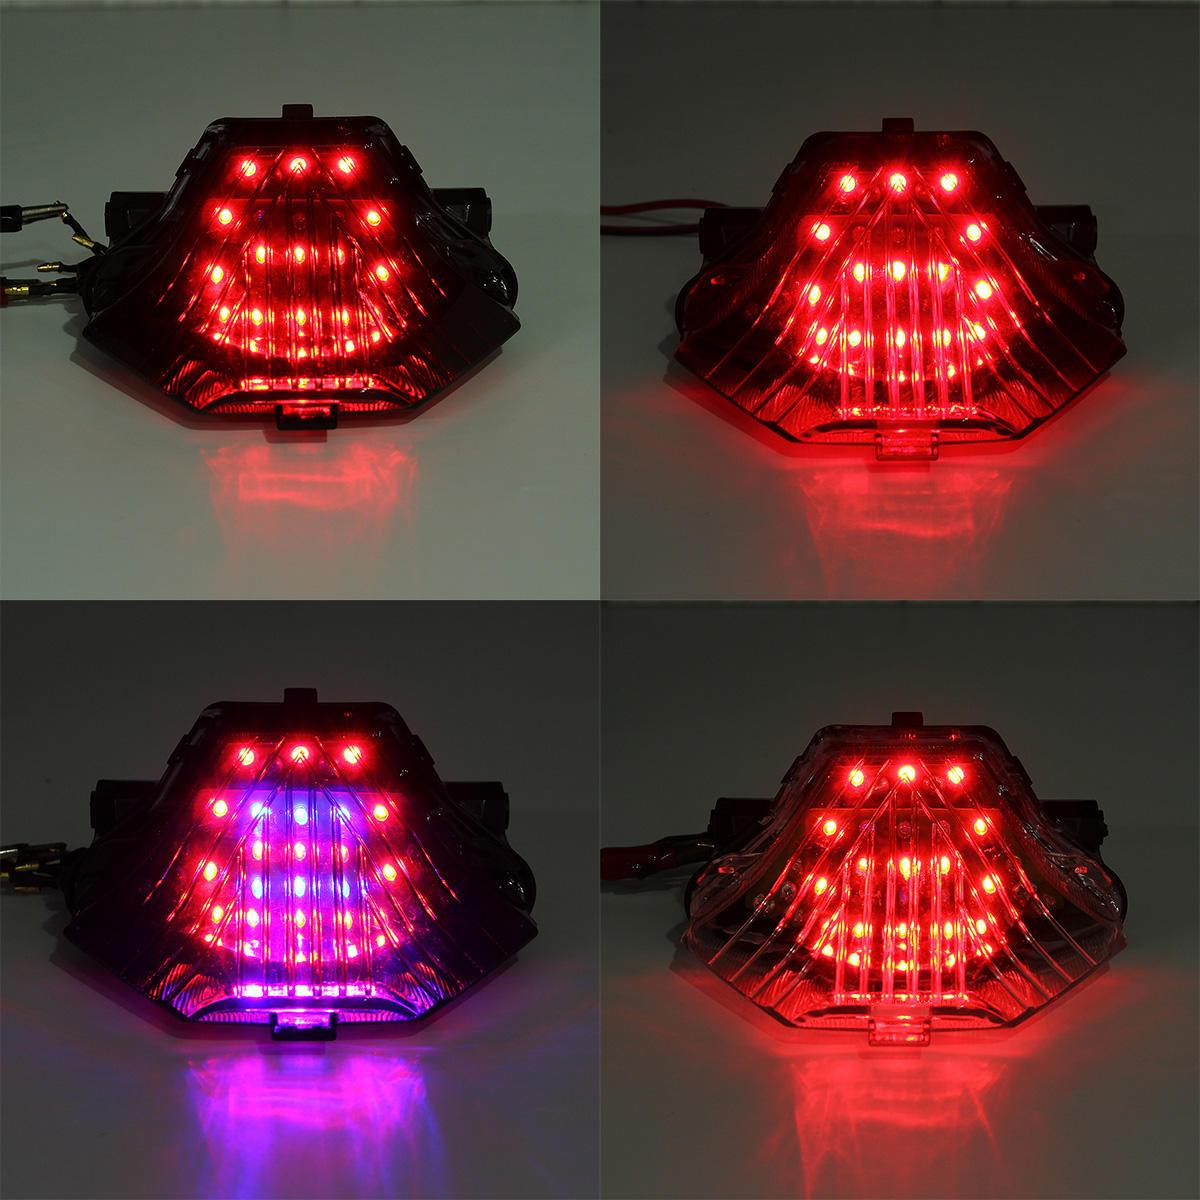 CNSUNNYLIGHT Car/Motorcycle LED Decoration Lights Emergency Signal Wings Lamp Projector Fog Warning - 2